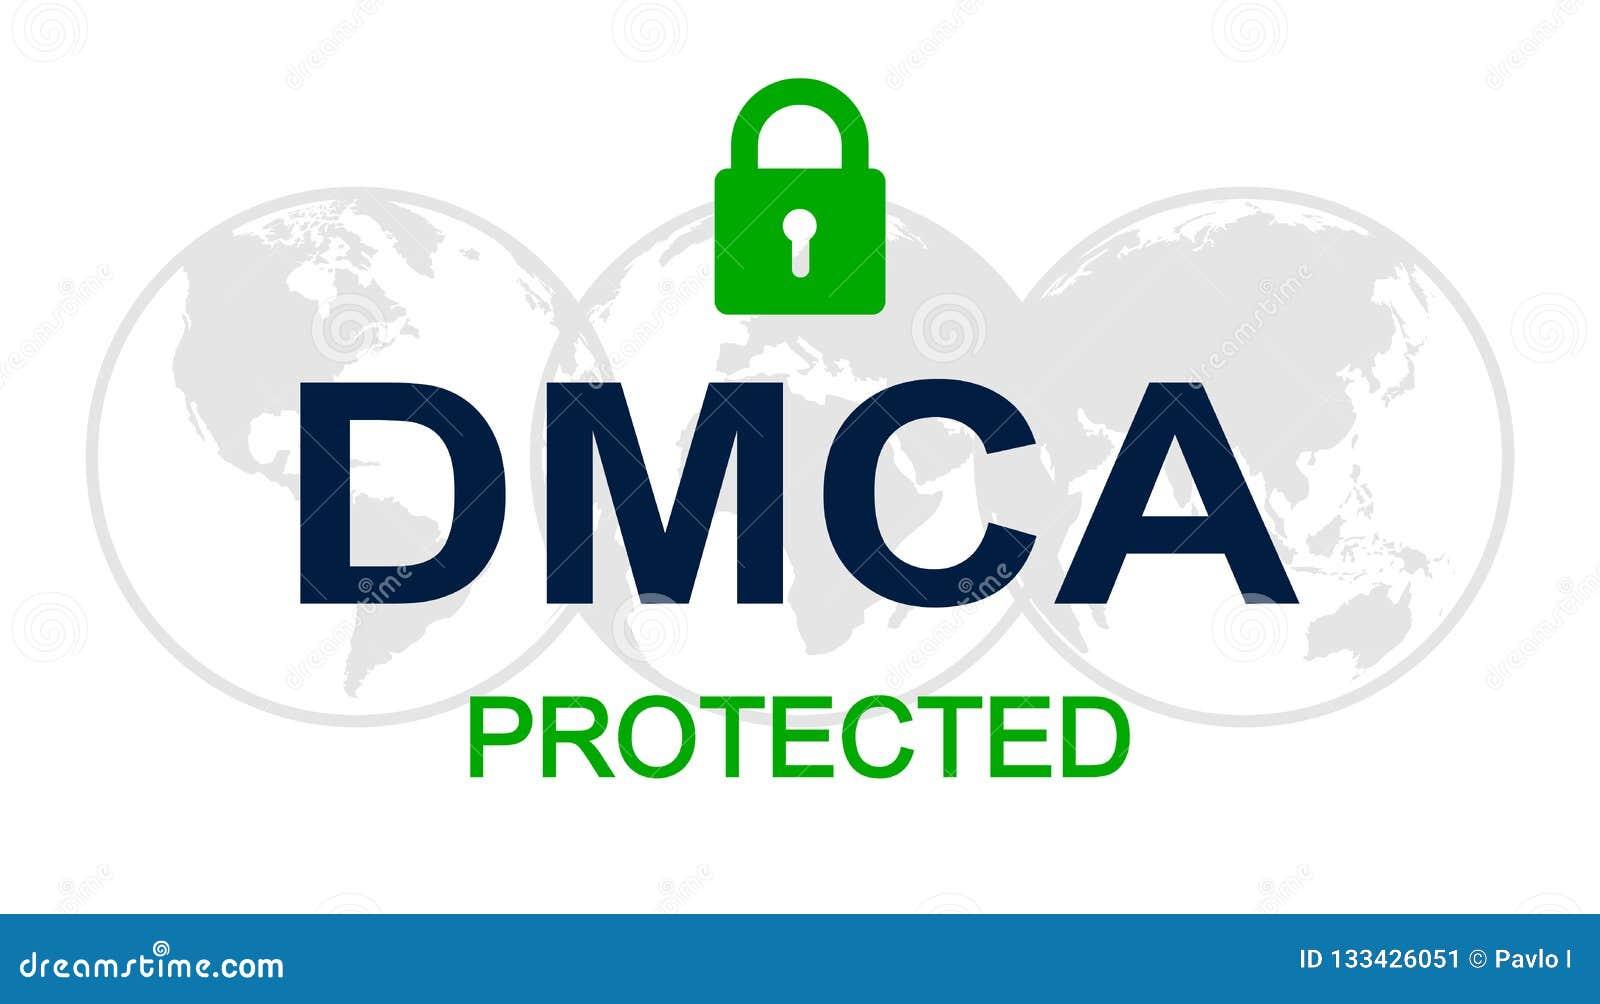 Dmca Digital Millennium Copyright Act Vector Stock